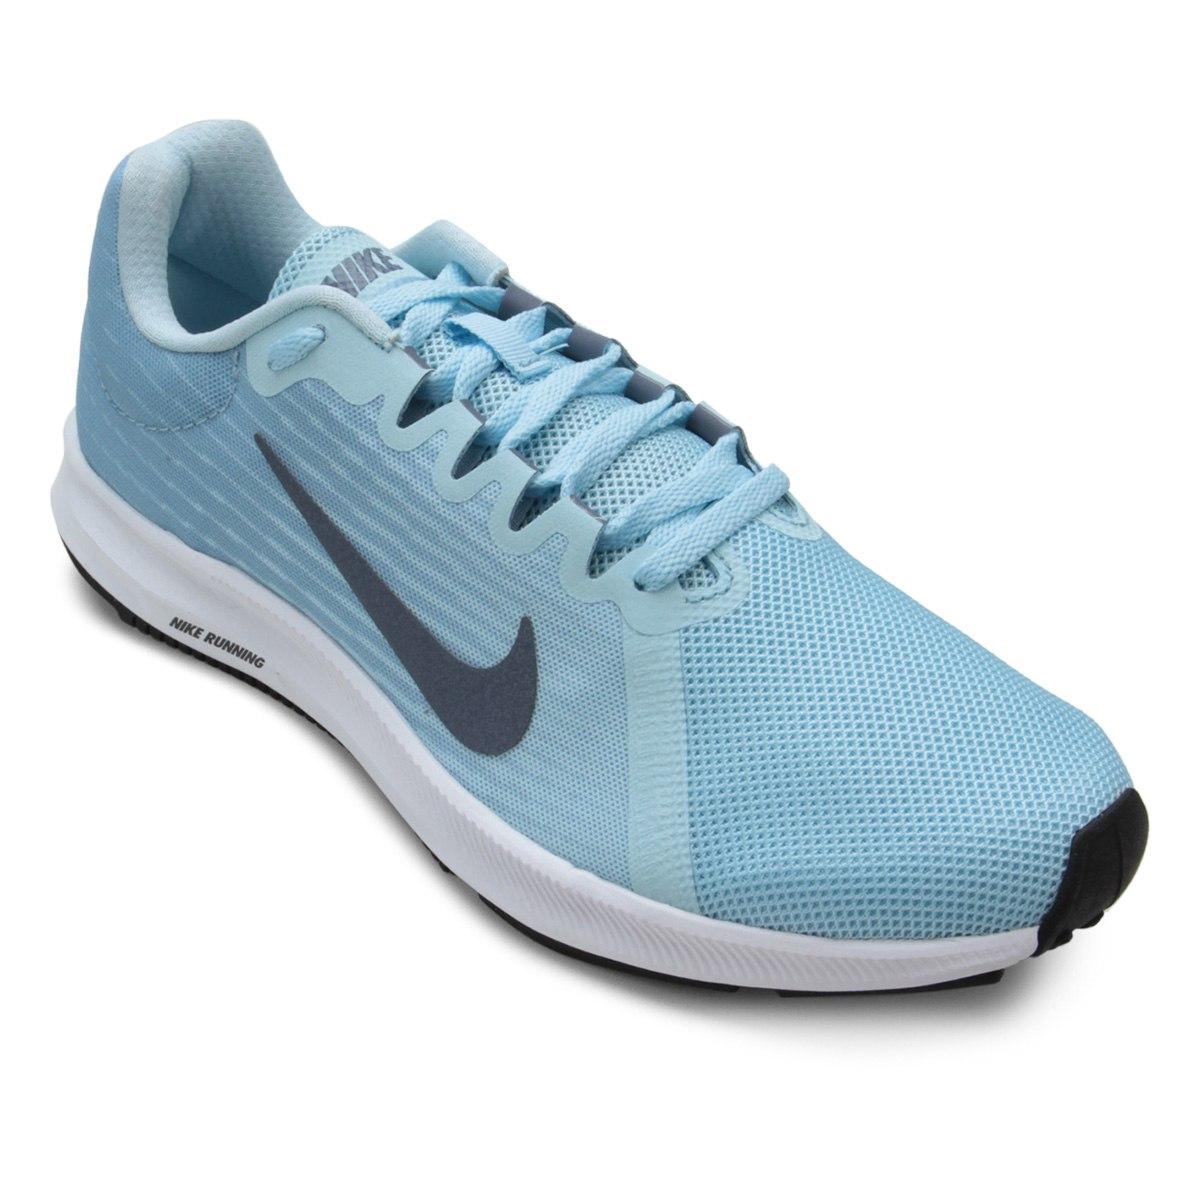 Tenis Nike Dowshifter 8 Cobalt Tint/ Lt Carbon/ Leche Blue/ WHT